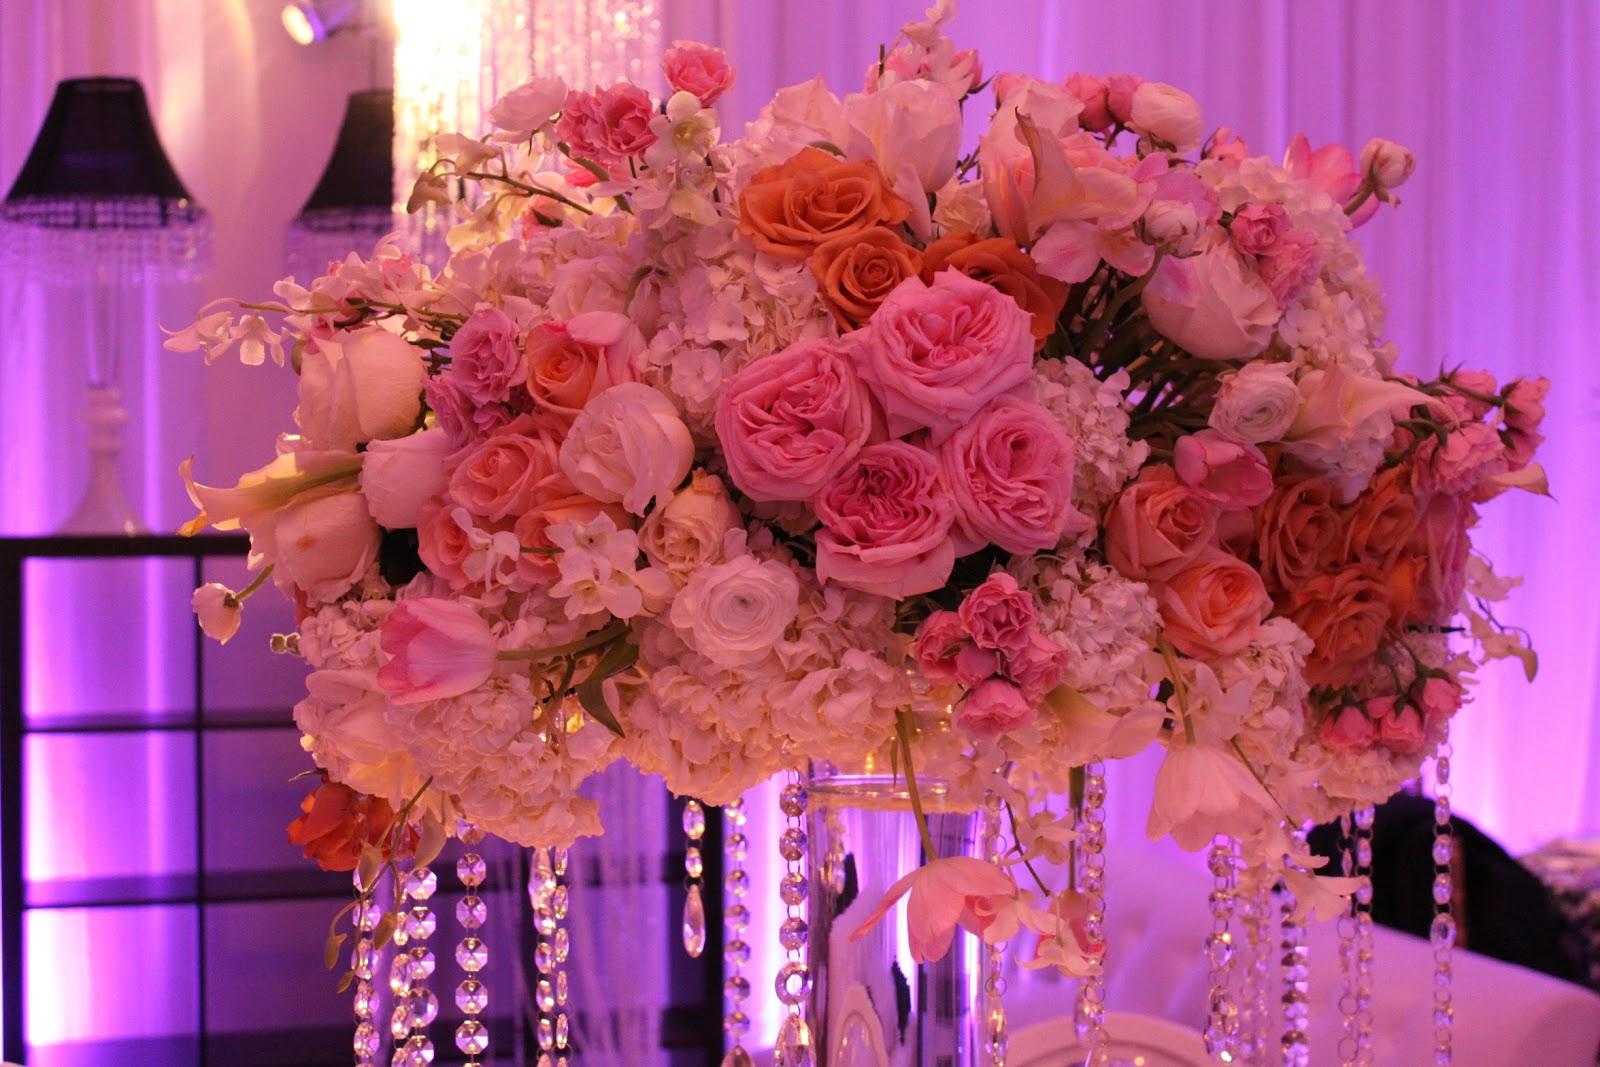 Wedding Centerpieces And Decor